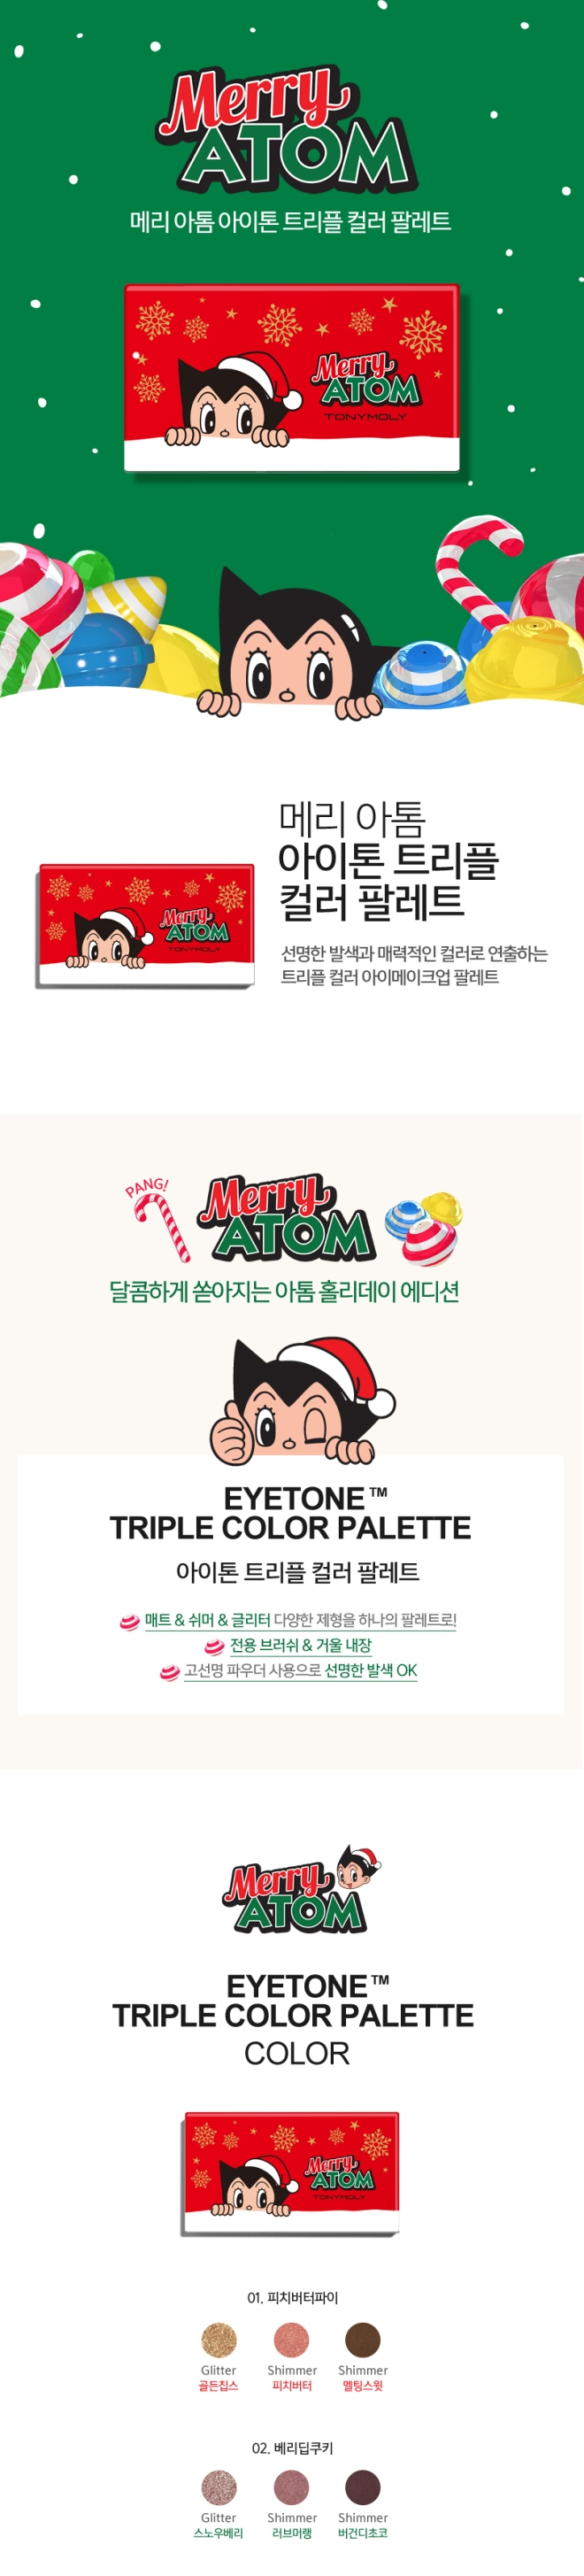 Tonymoly Merry Atom Eyetone Triple Color Palette